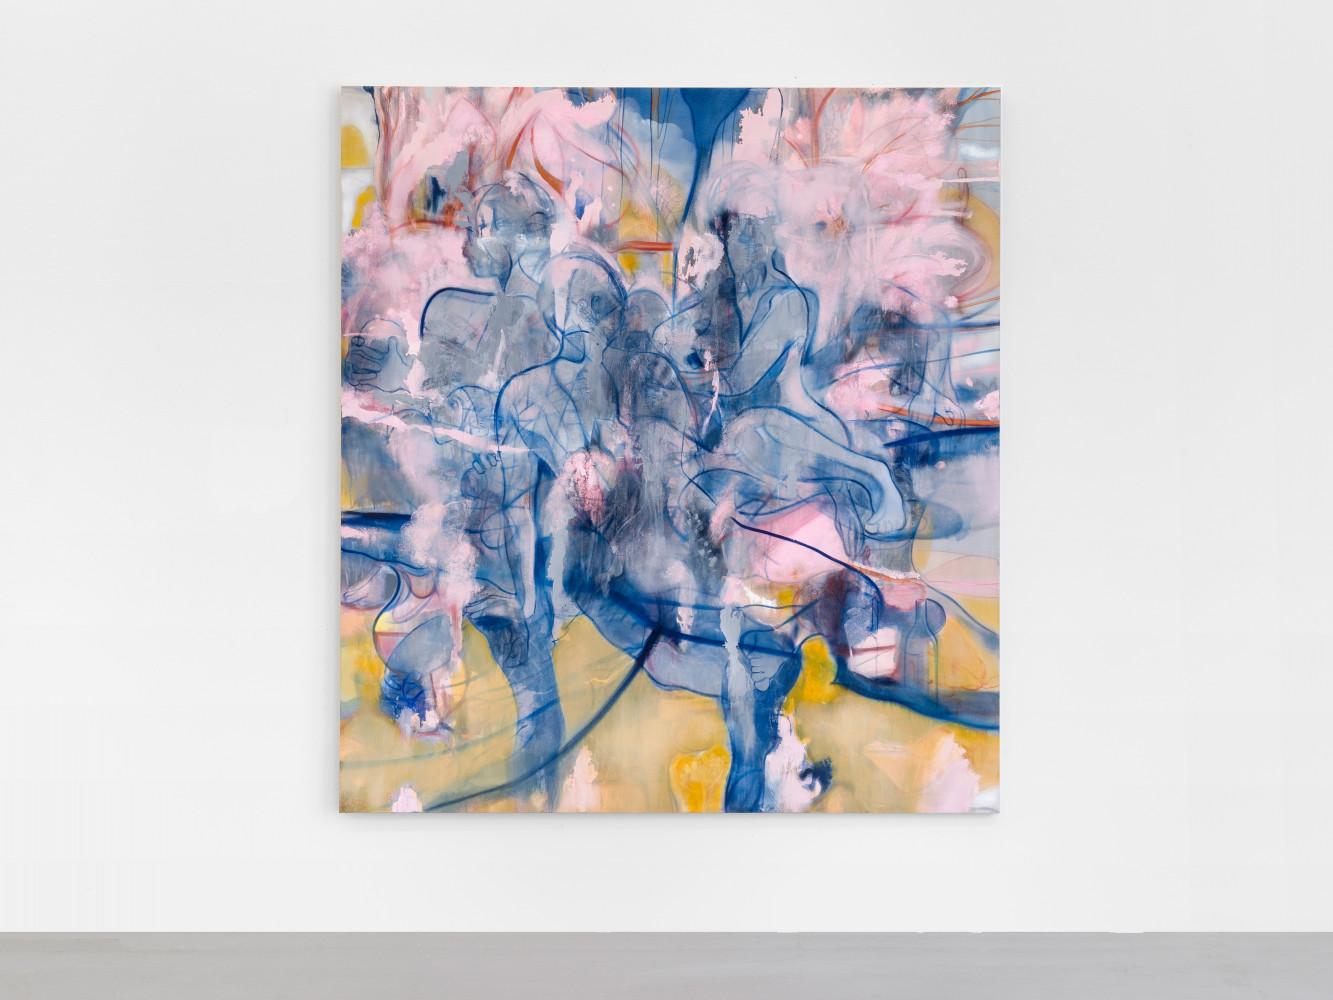 Nigel Cooke, 'Blossom Shade', 2019